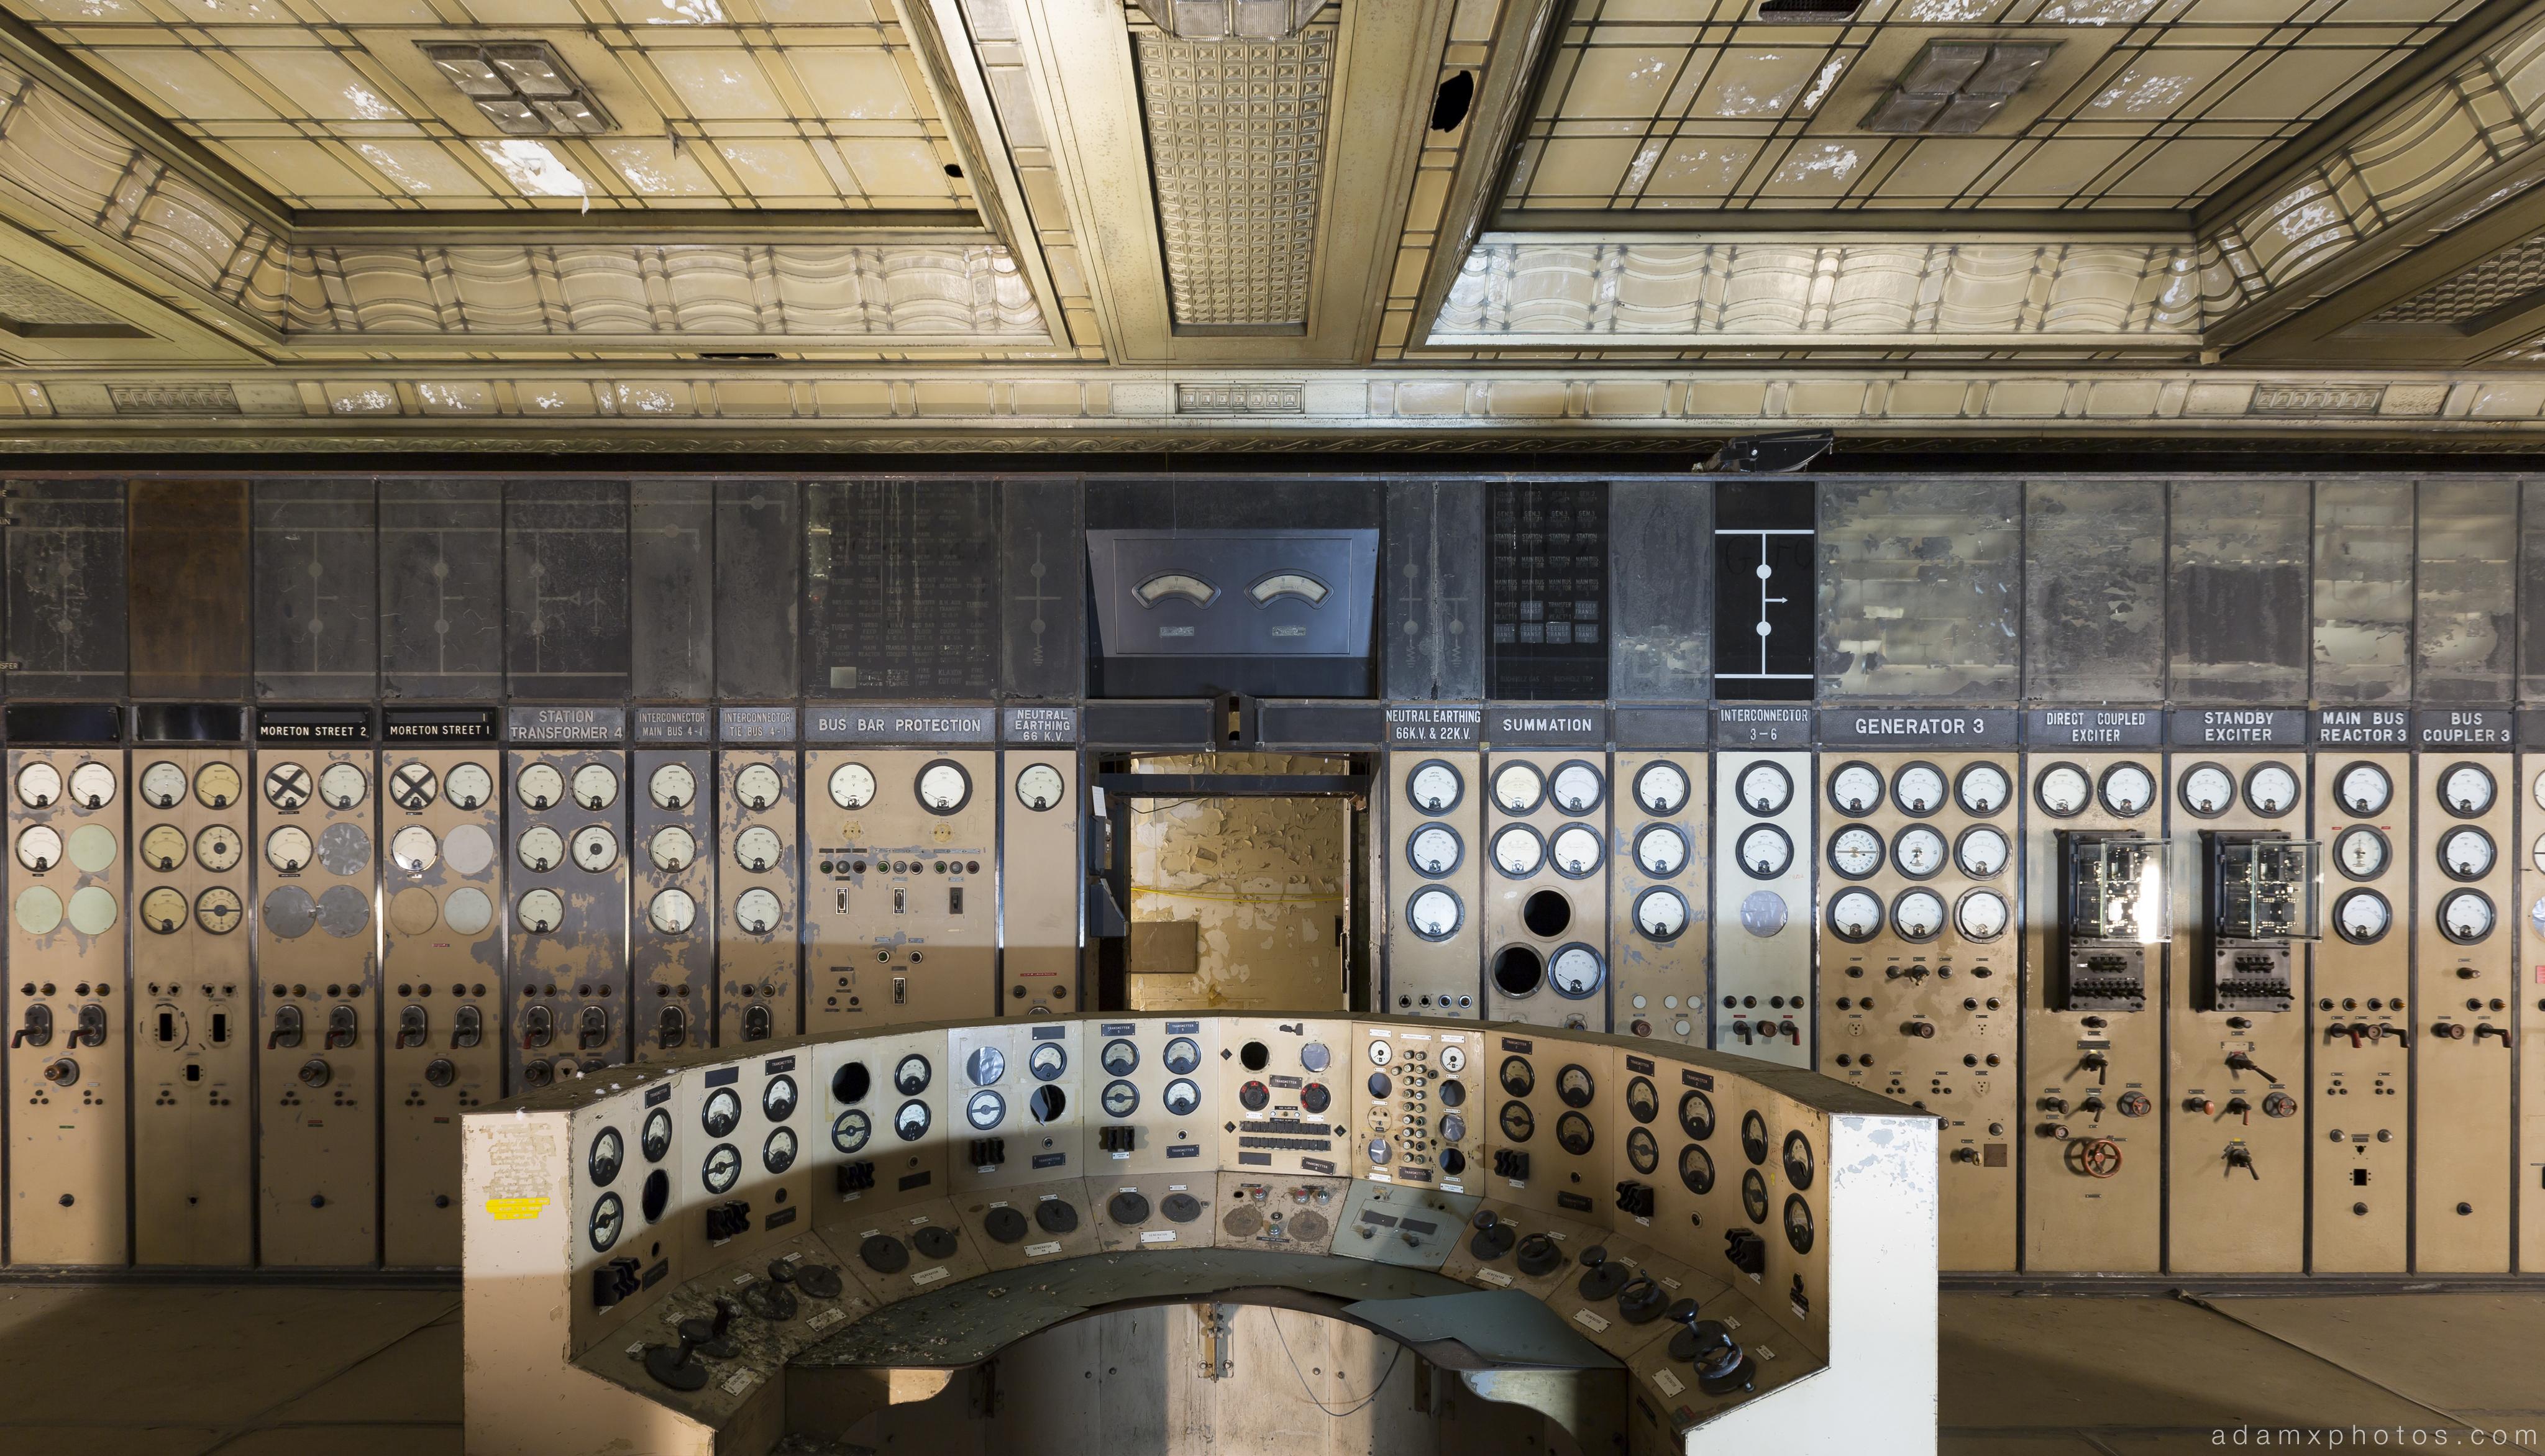 panel dials Control Room A Battersea Power Station Urbex Adam X Urban Exploration 2015 Abandoned decay lost forgotten derelict